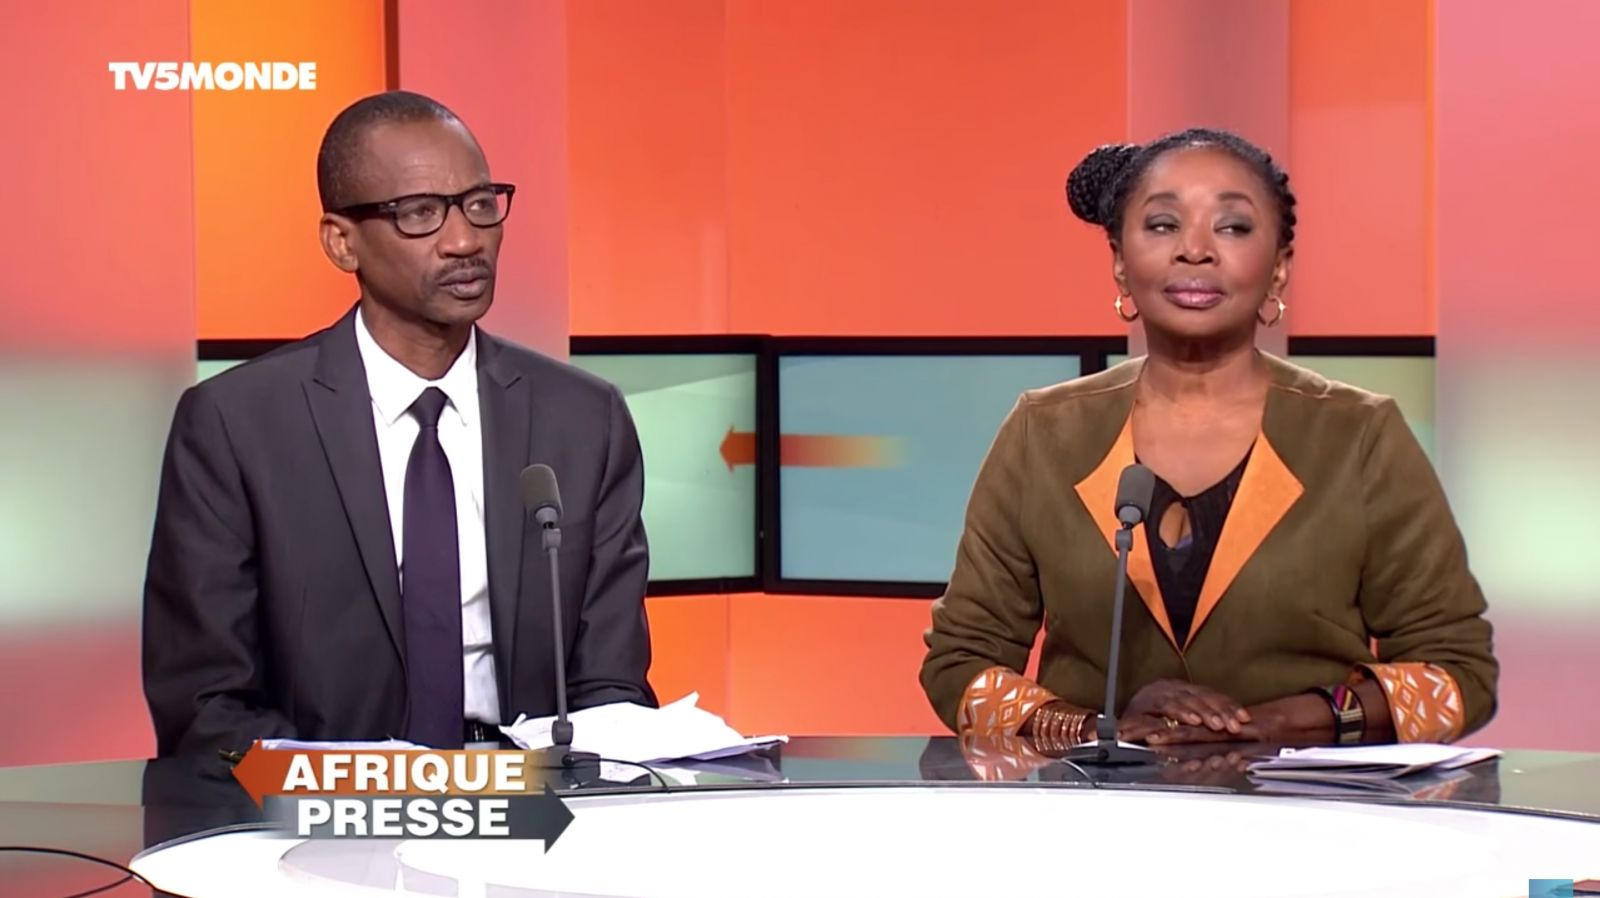 Racine Talla justifie l'emprisonnement de Khalifa Sall sur TV5